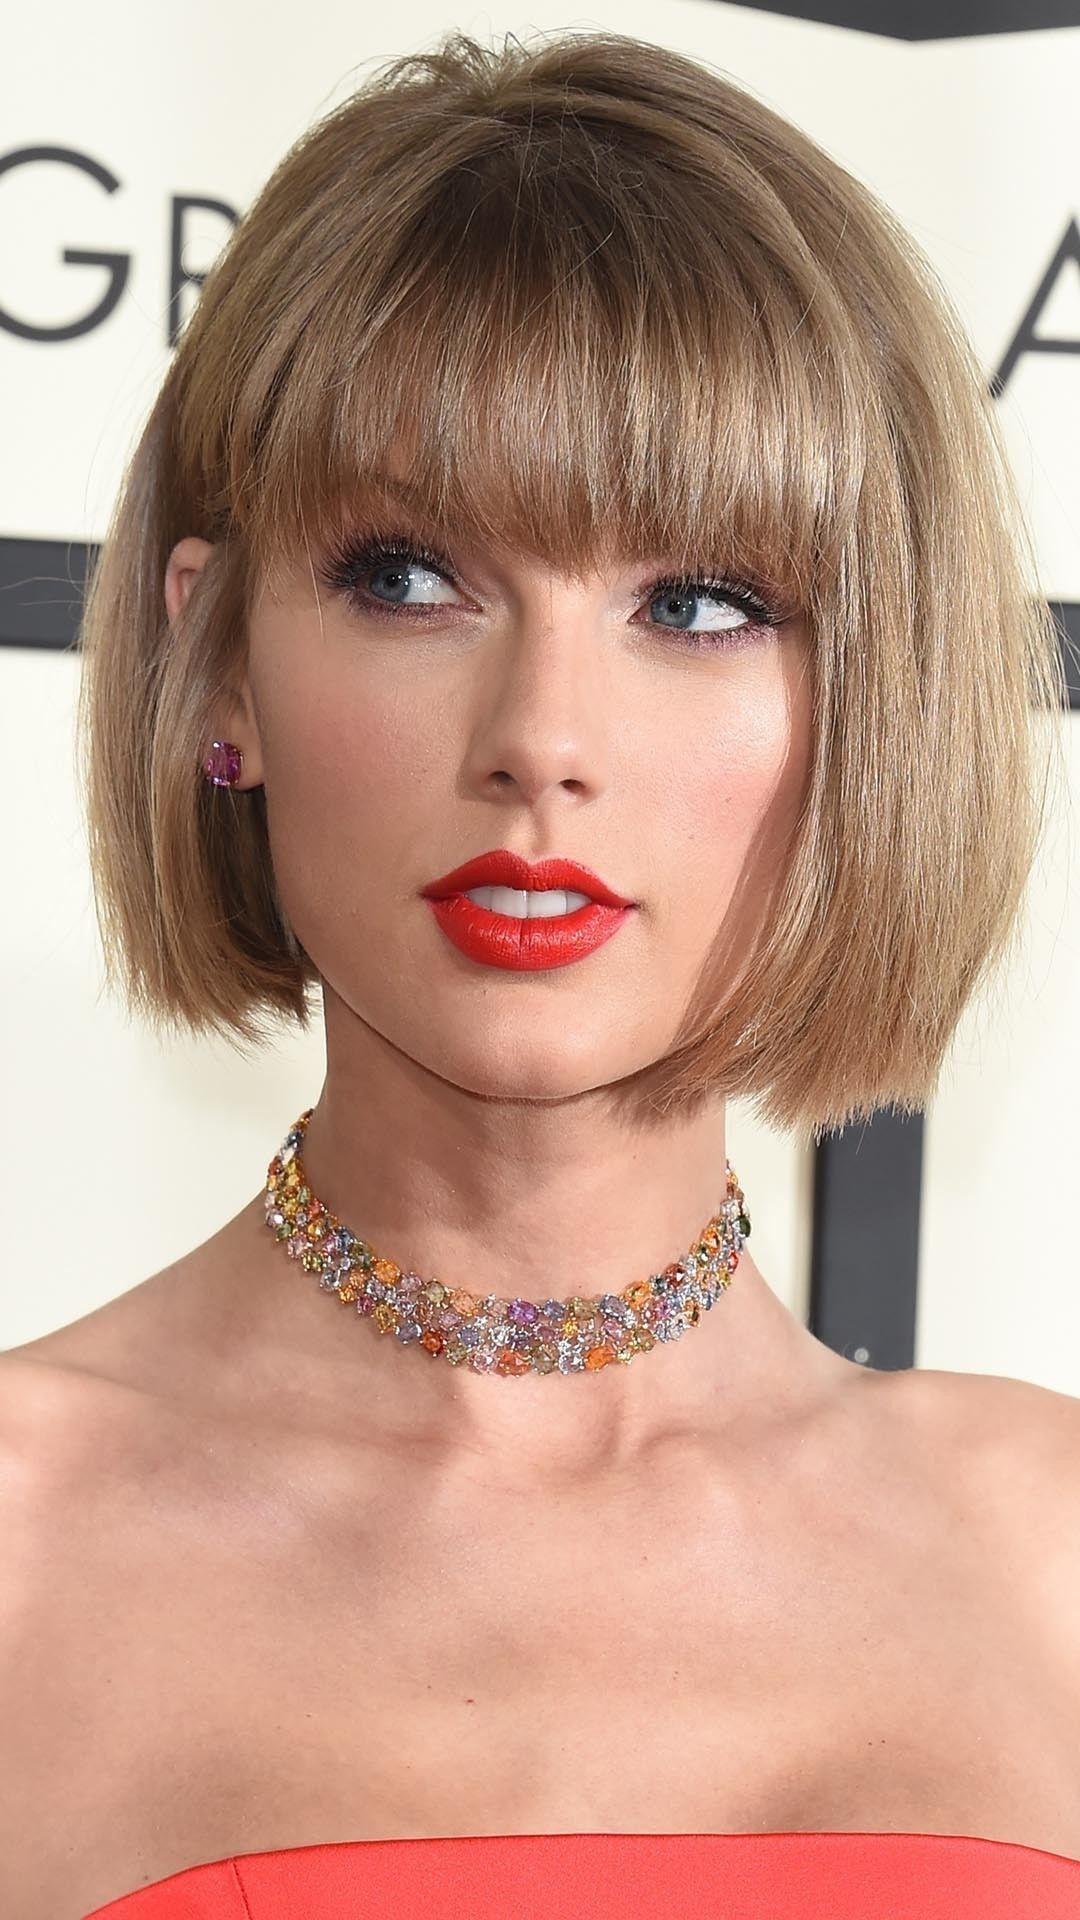 Pin By Rafael Lozada On Taylor Swift Taylor Swift Hot Taylor Swift Pictures Taylor Alison Swift